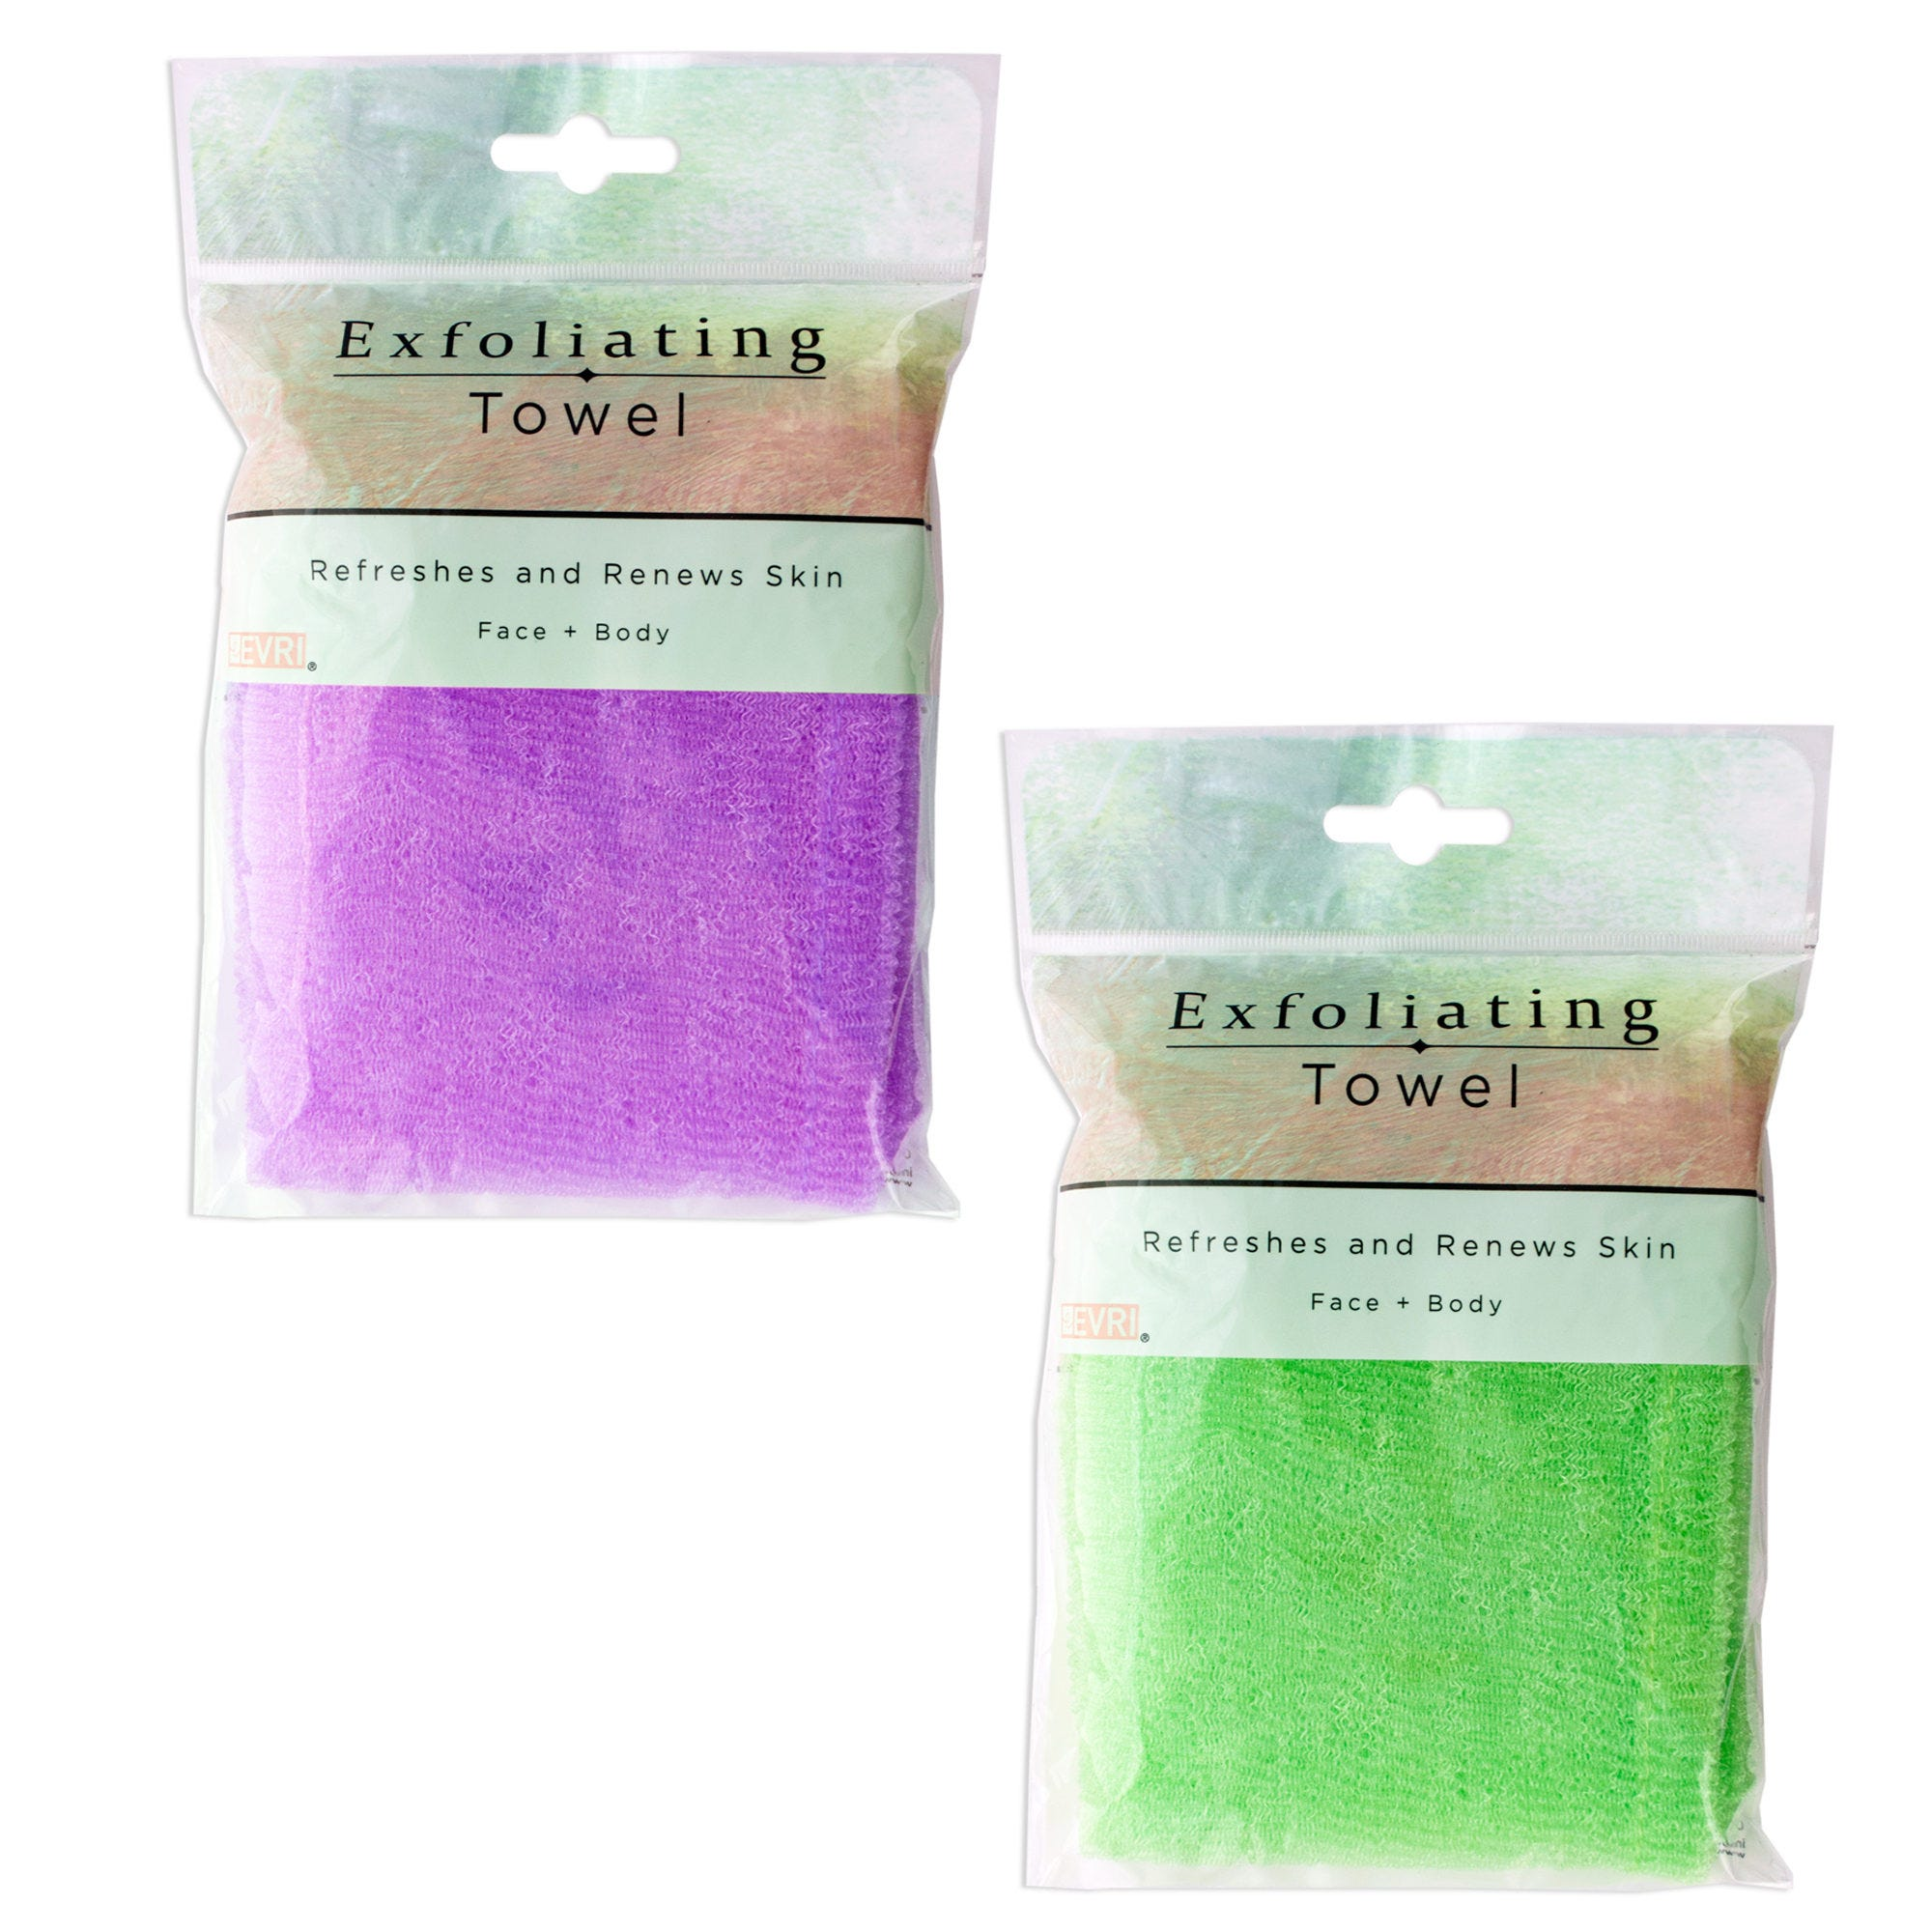 Exfoliating Shower Towel Clip Strip- Qty 9